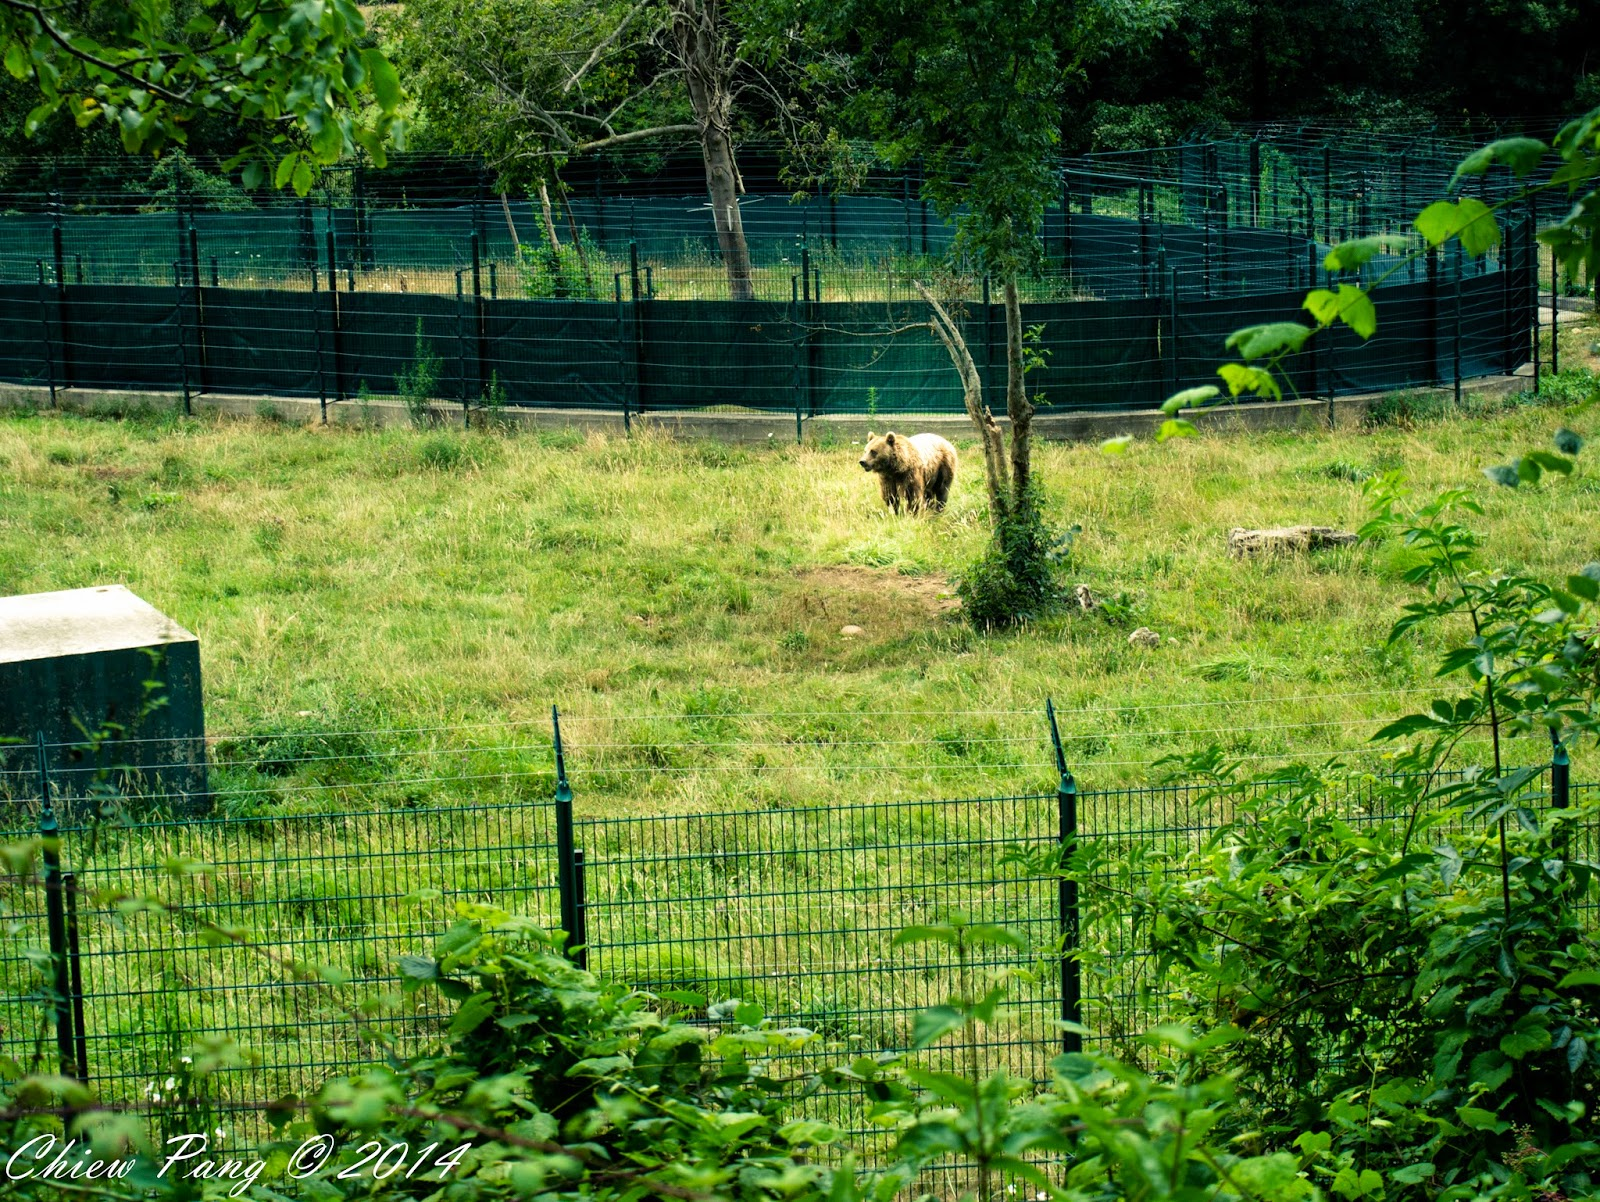 Asturian bear, Proaza, Asturias